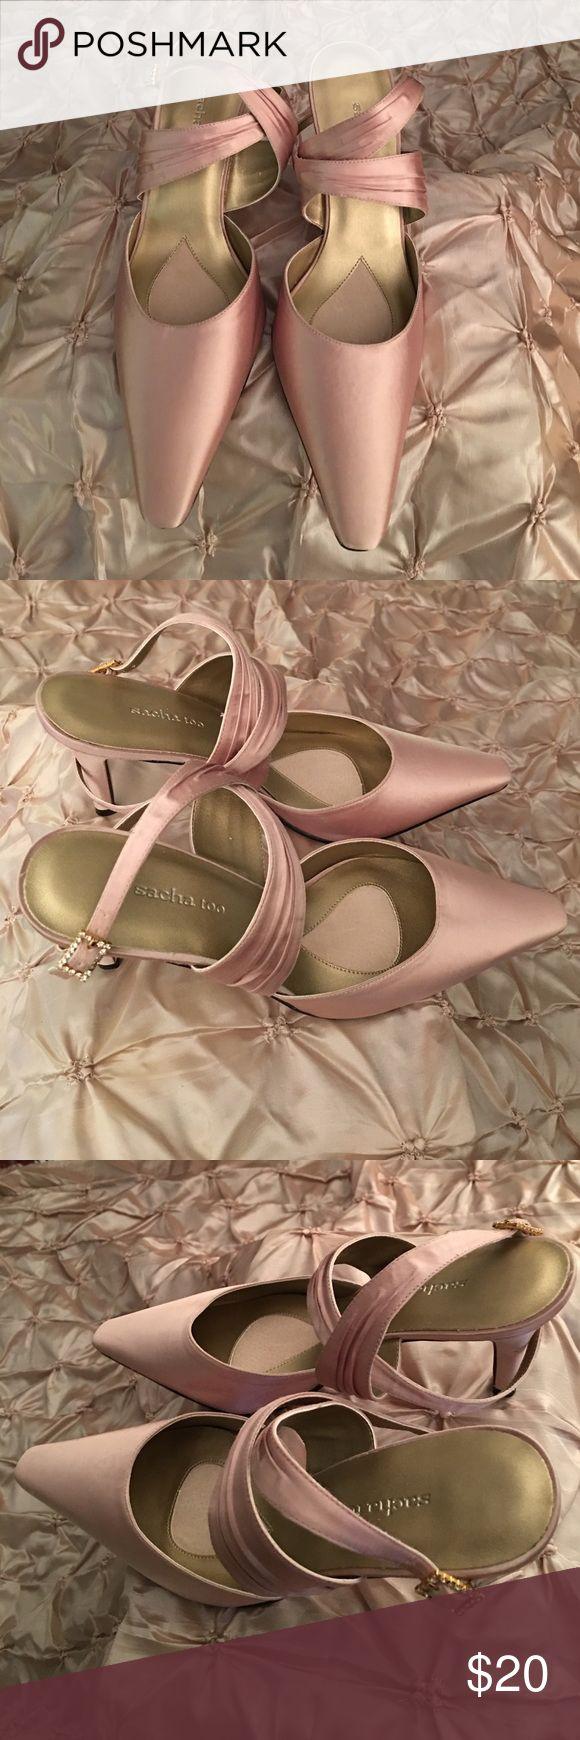 Sacha too Dressy Heels Sacha too Dressy Heels Champaign Pink Sacha too Shoes Heels